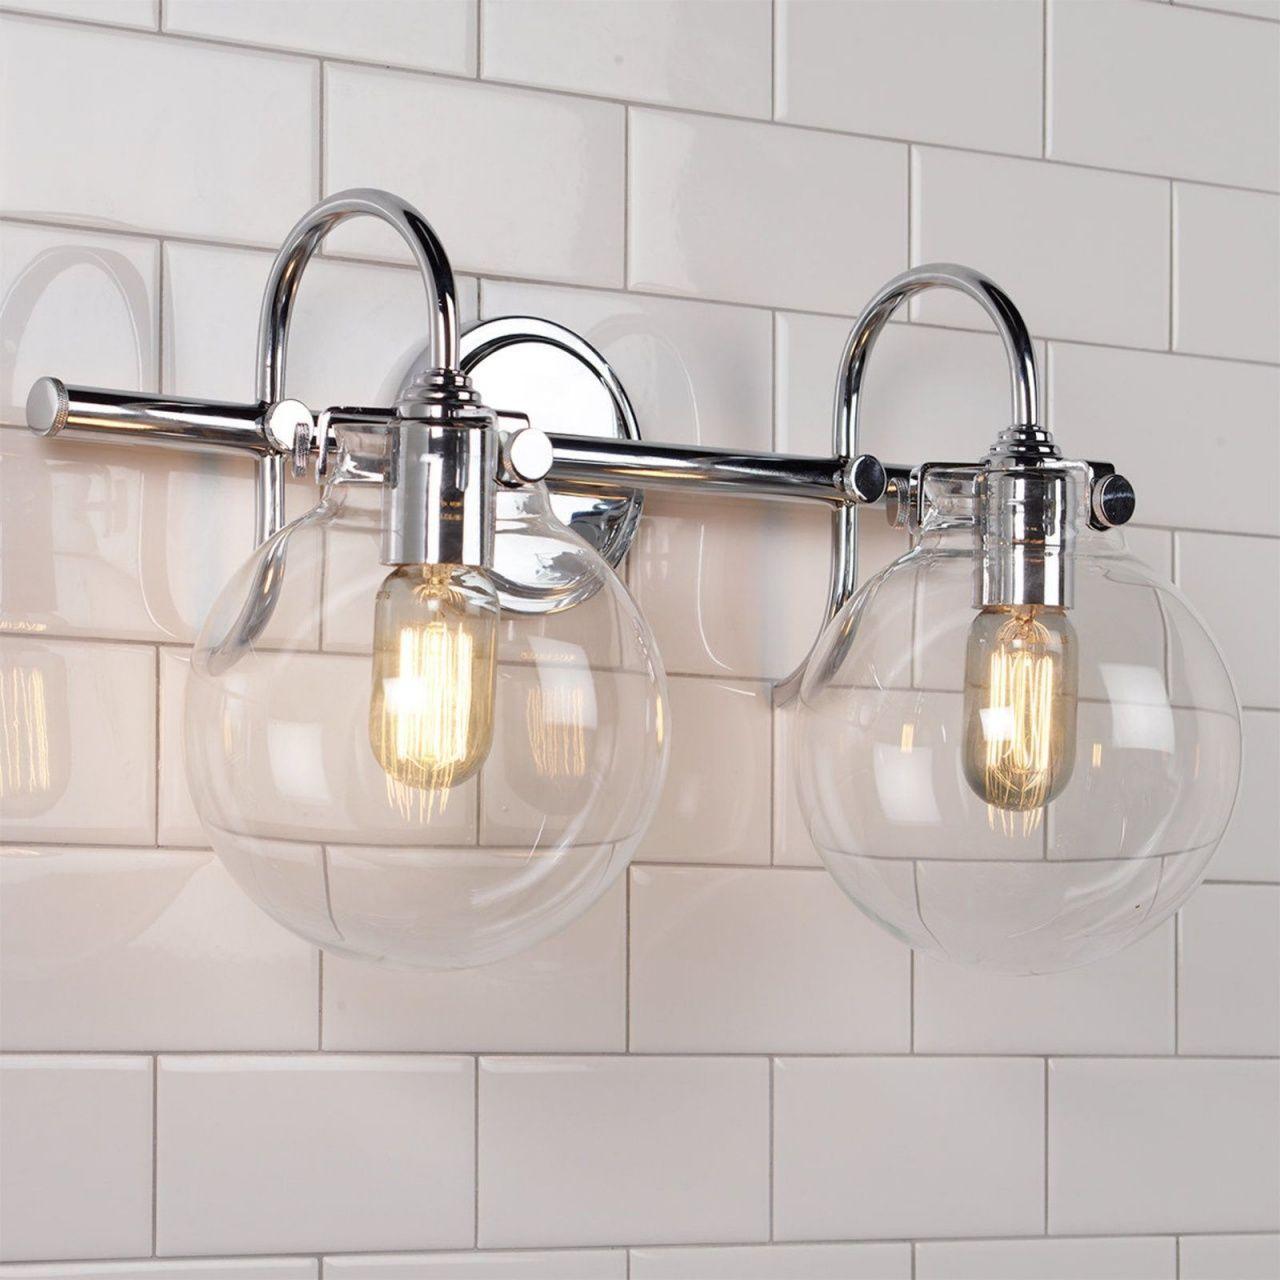 Photo of Restoration hardware bathroom lights